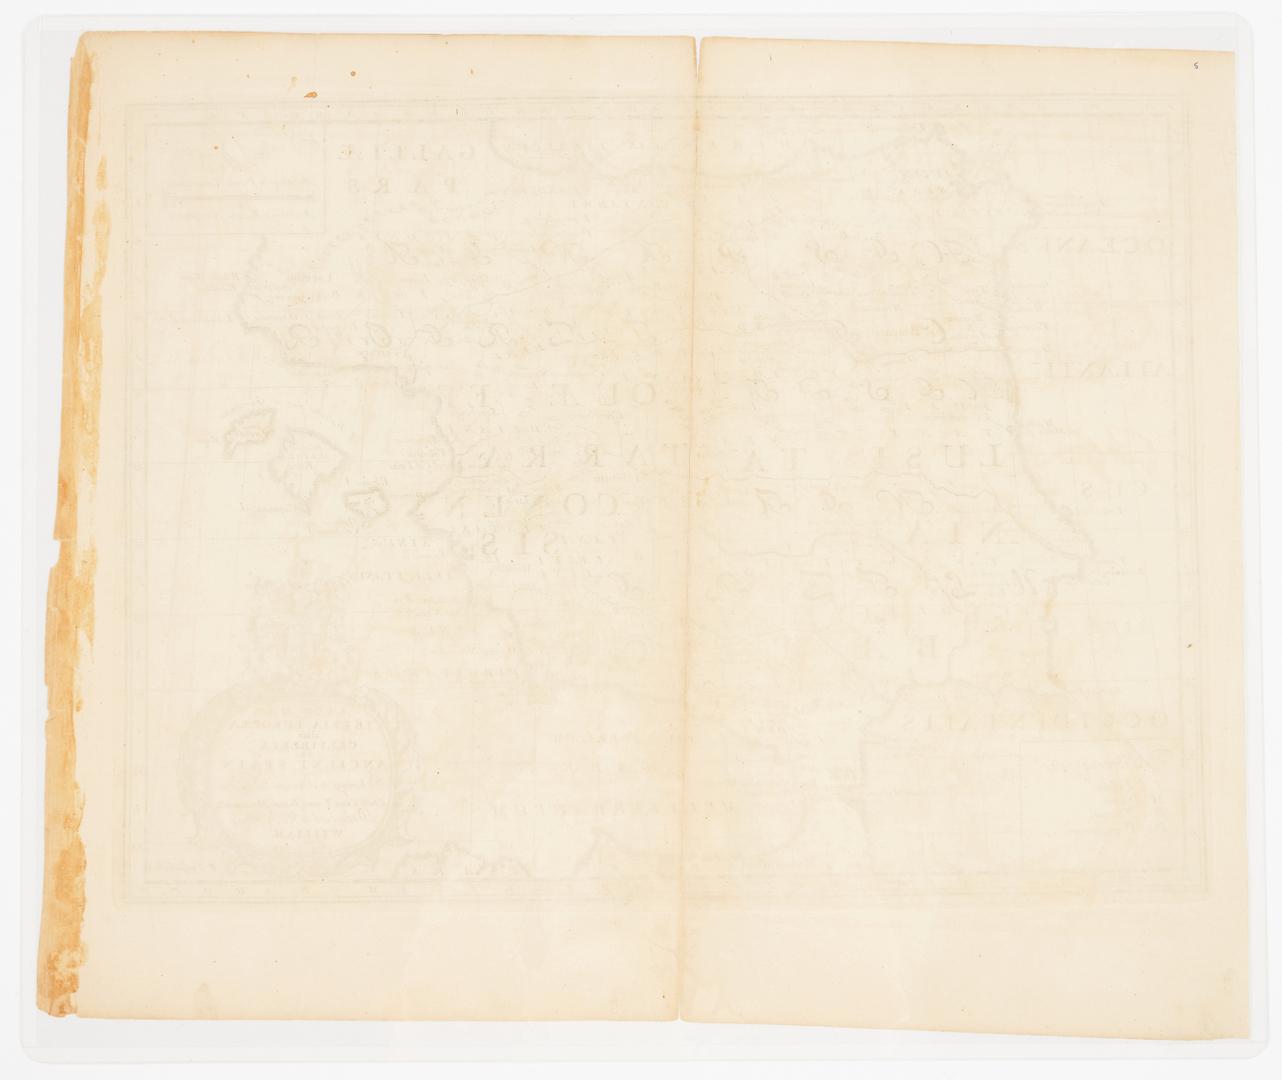 Lot 579: Edward Wells, 13 Maps incl. Africa